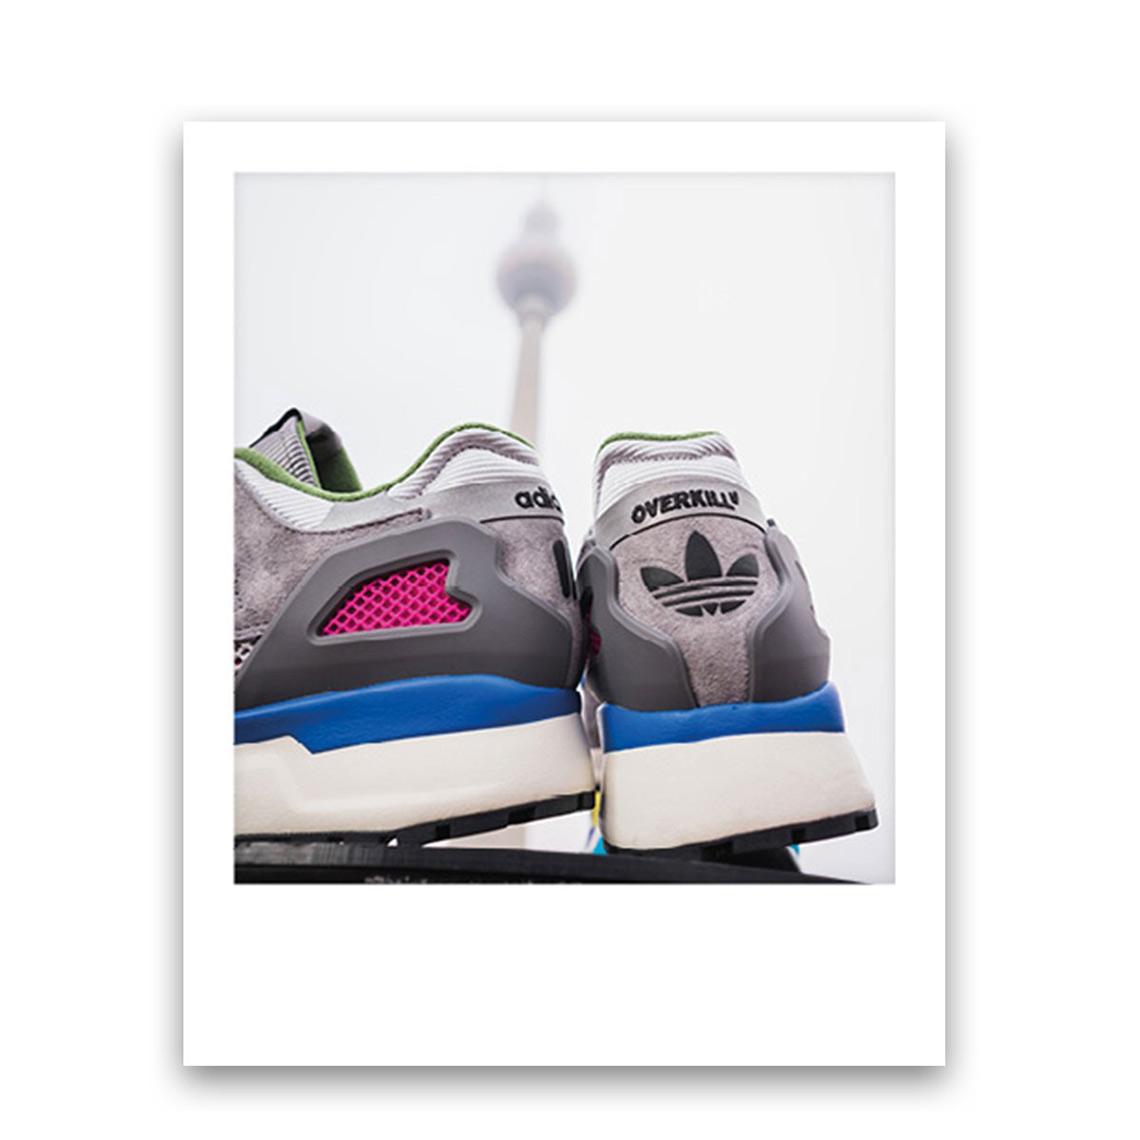 shopping official supplier buy good Overkill adidas ZX 10000C G26252 Release Info | SneakerNews.com